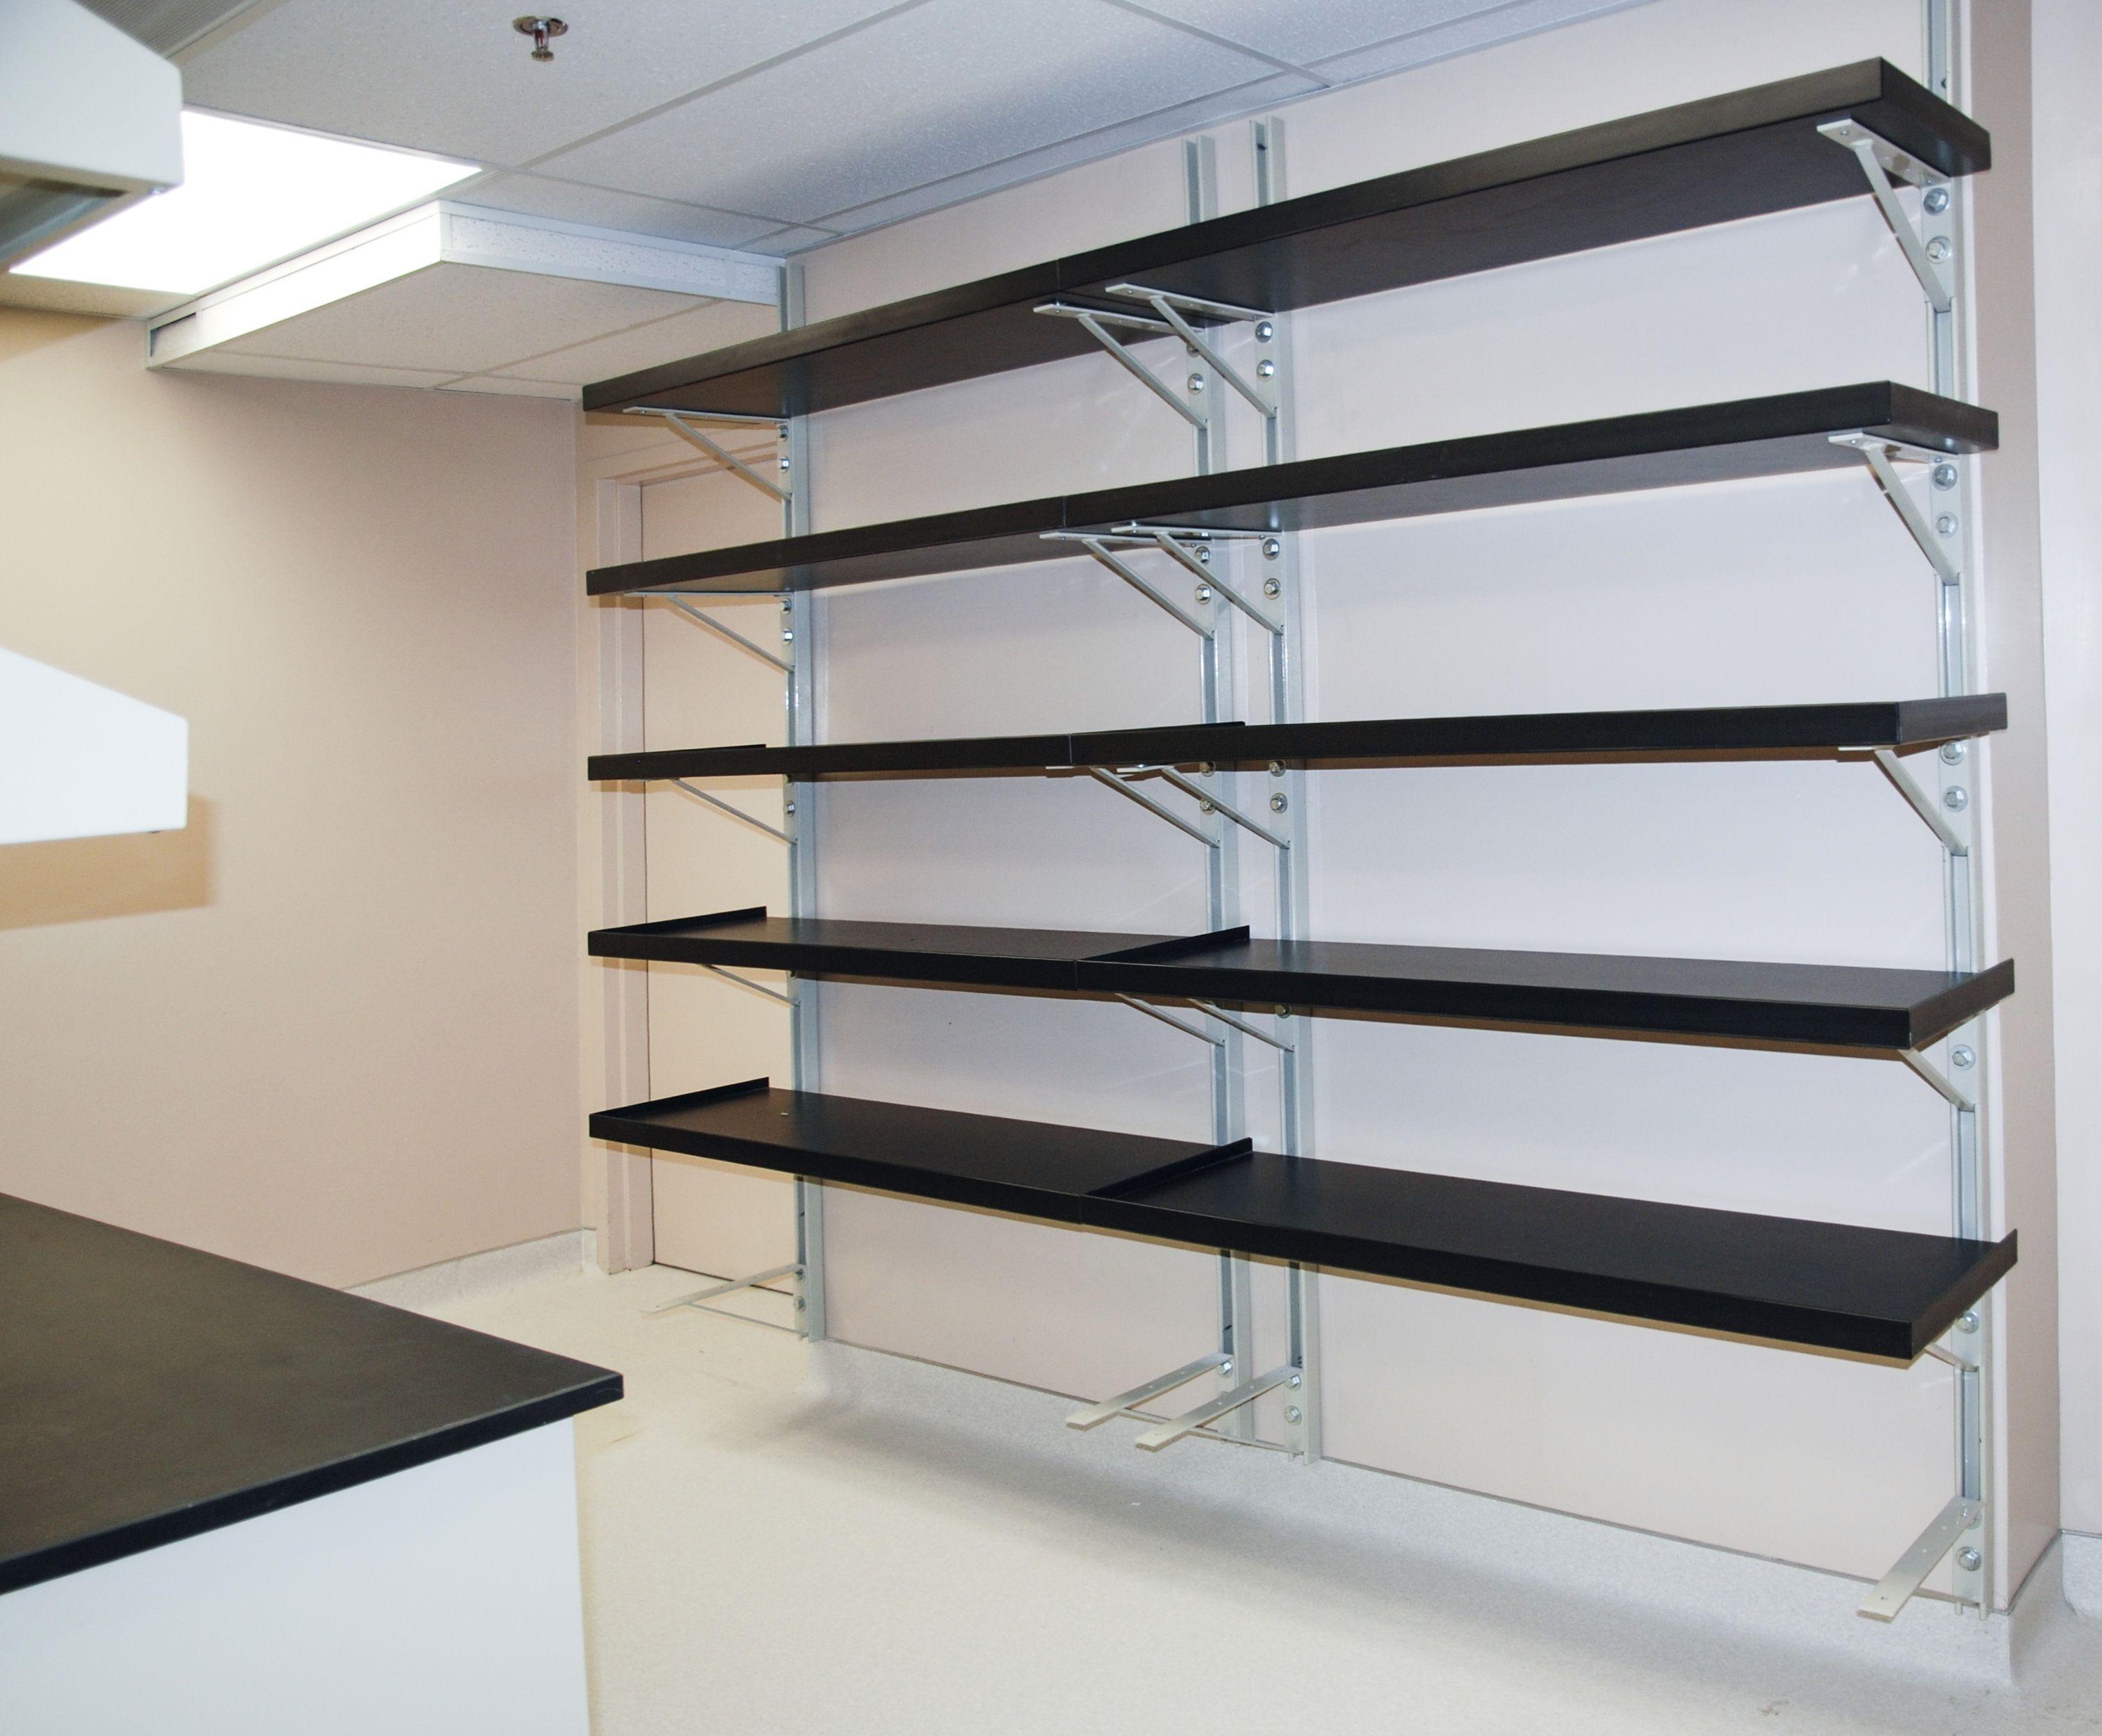 Wall Mounted Shelves For Heavy Books Wall Shelving Systems Wall Mounted Shelving Unit Adjustable Wall Shelving